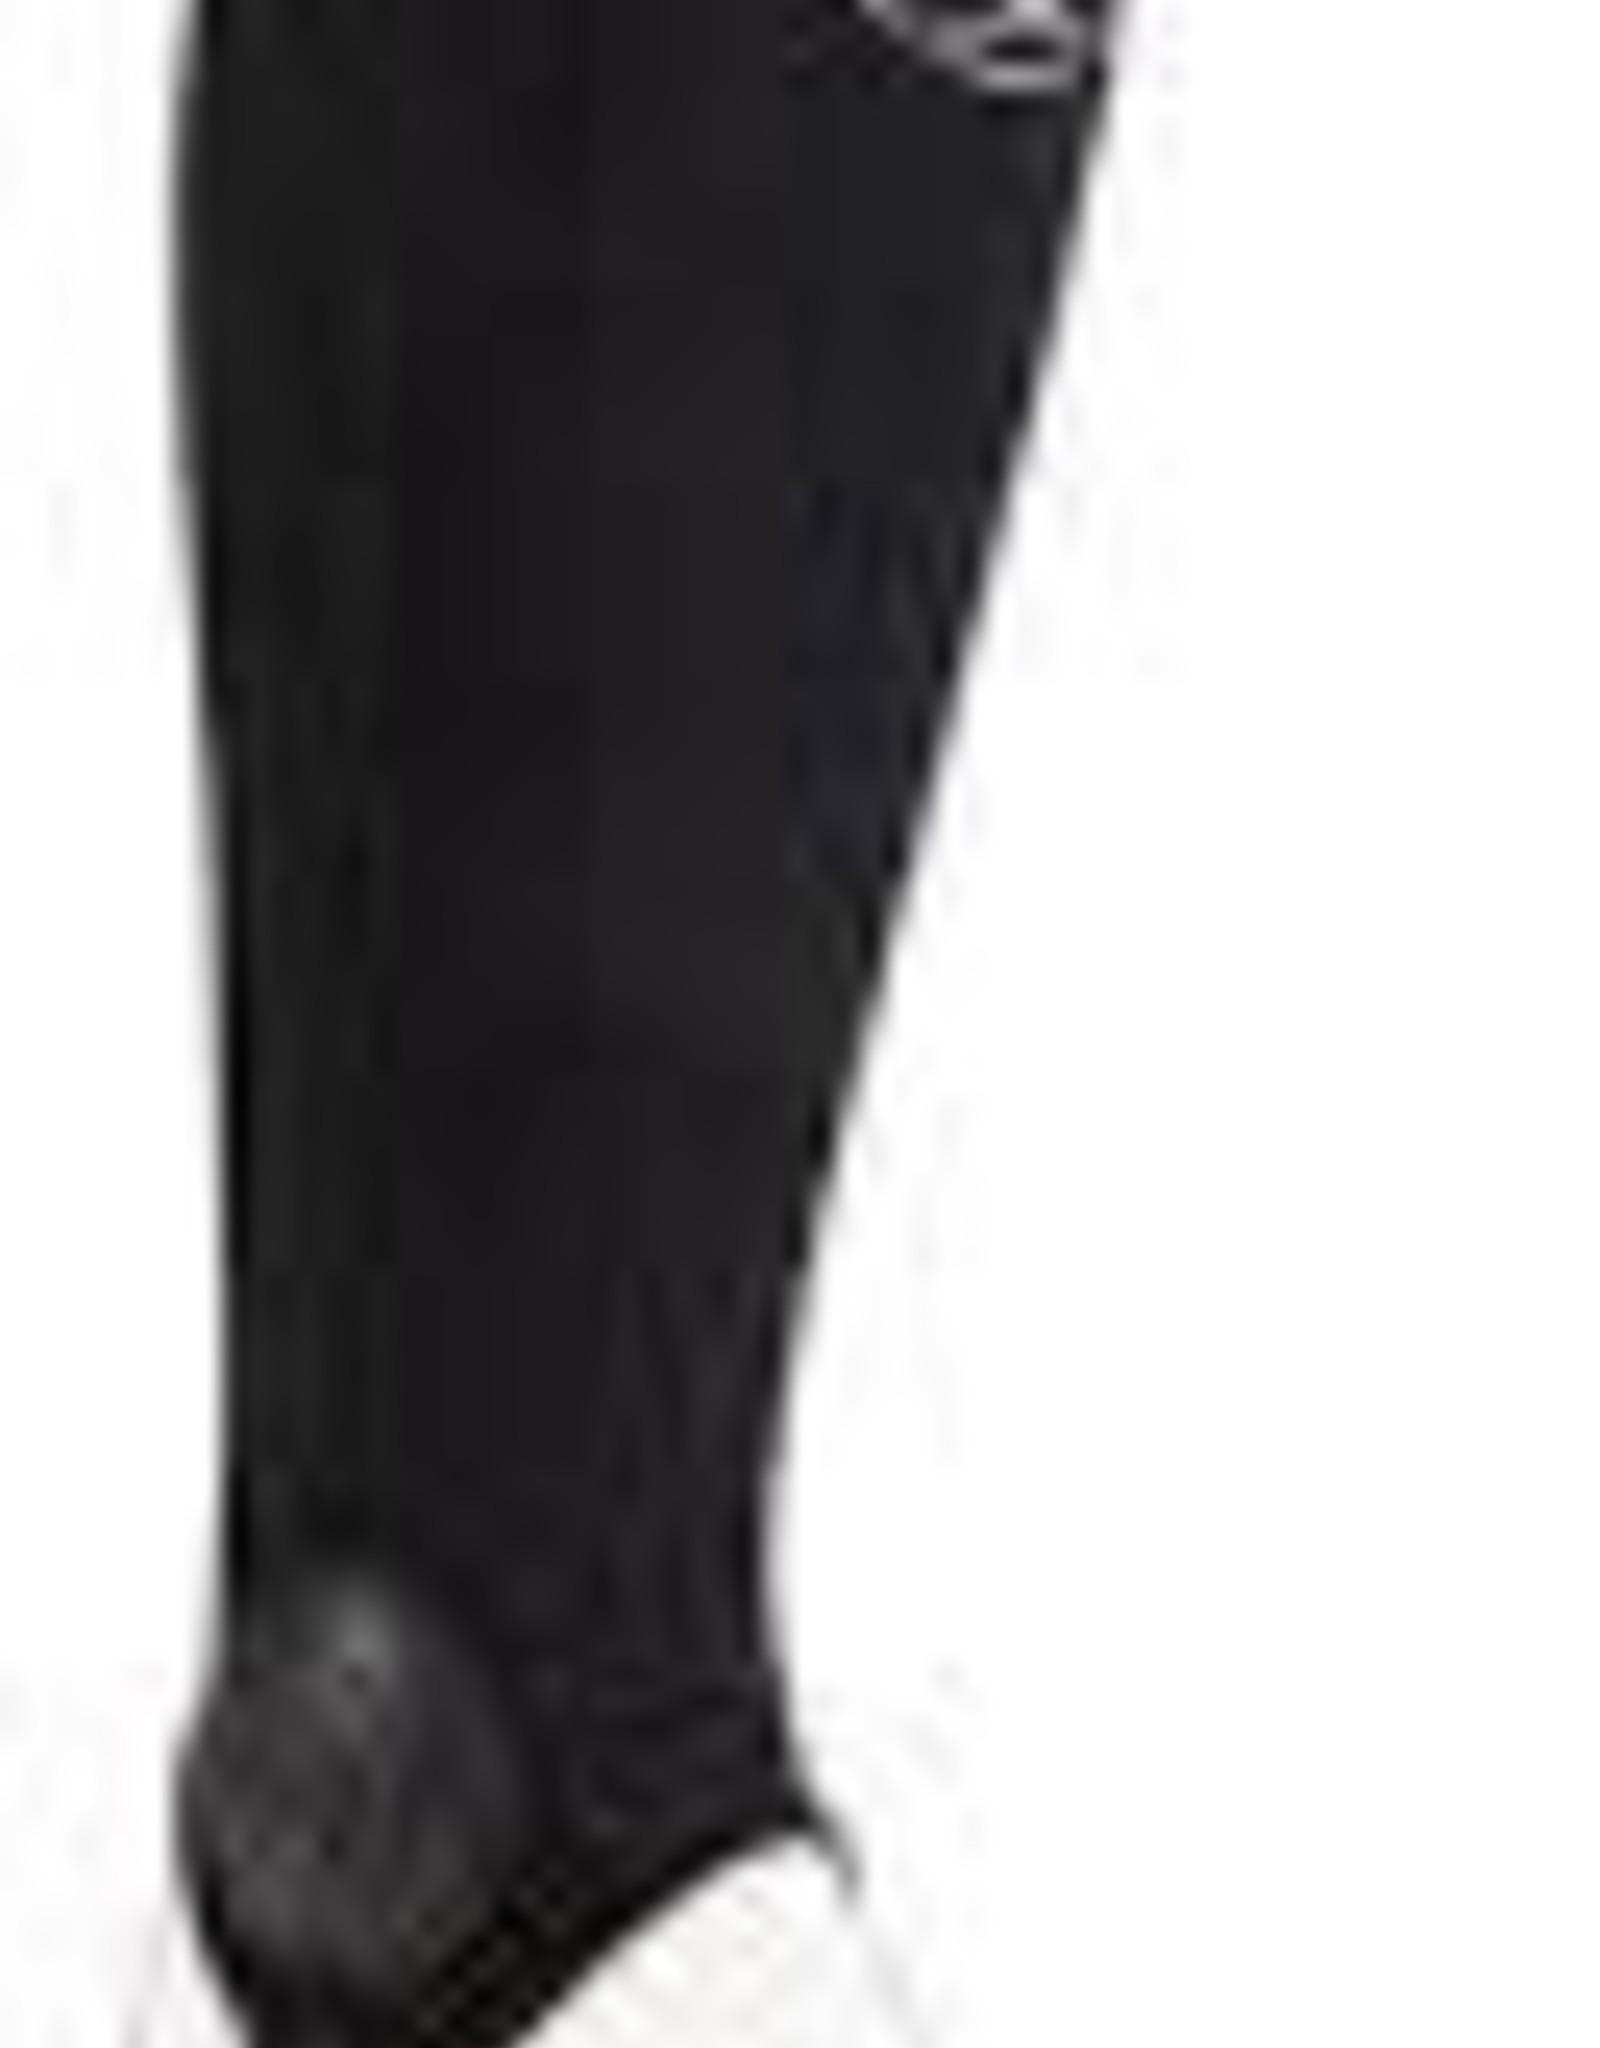 Xara Xara V2 Sleeve and Ankle Guard